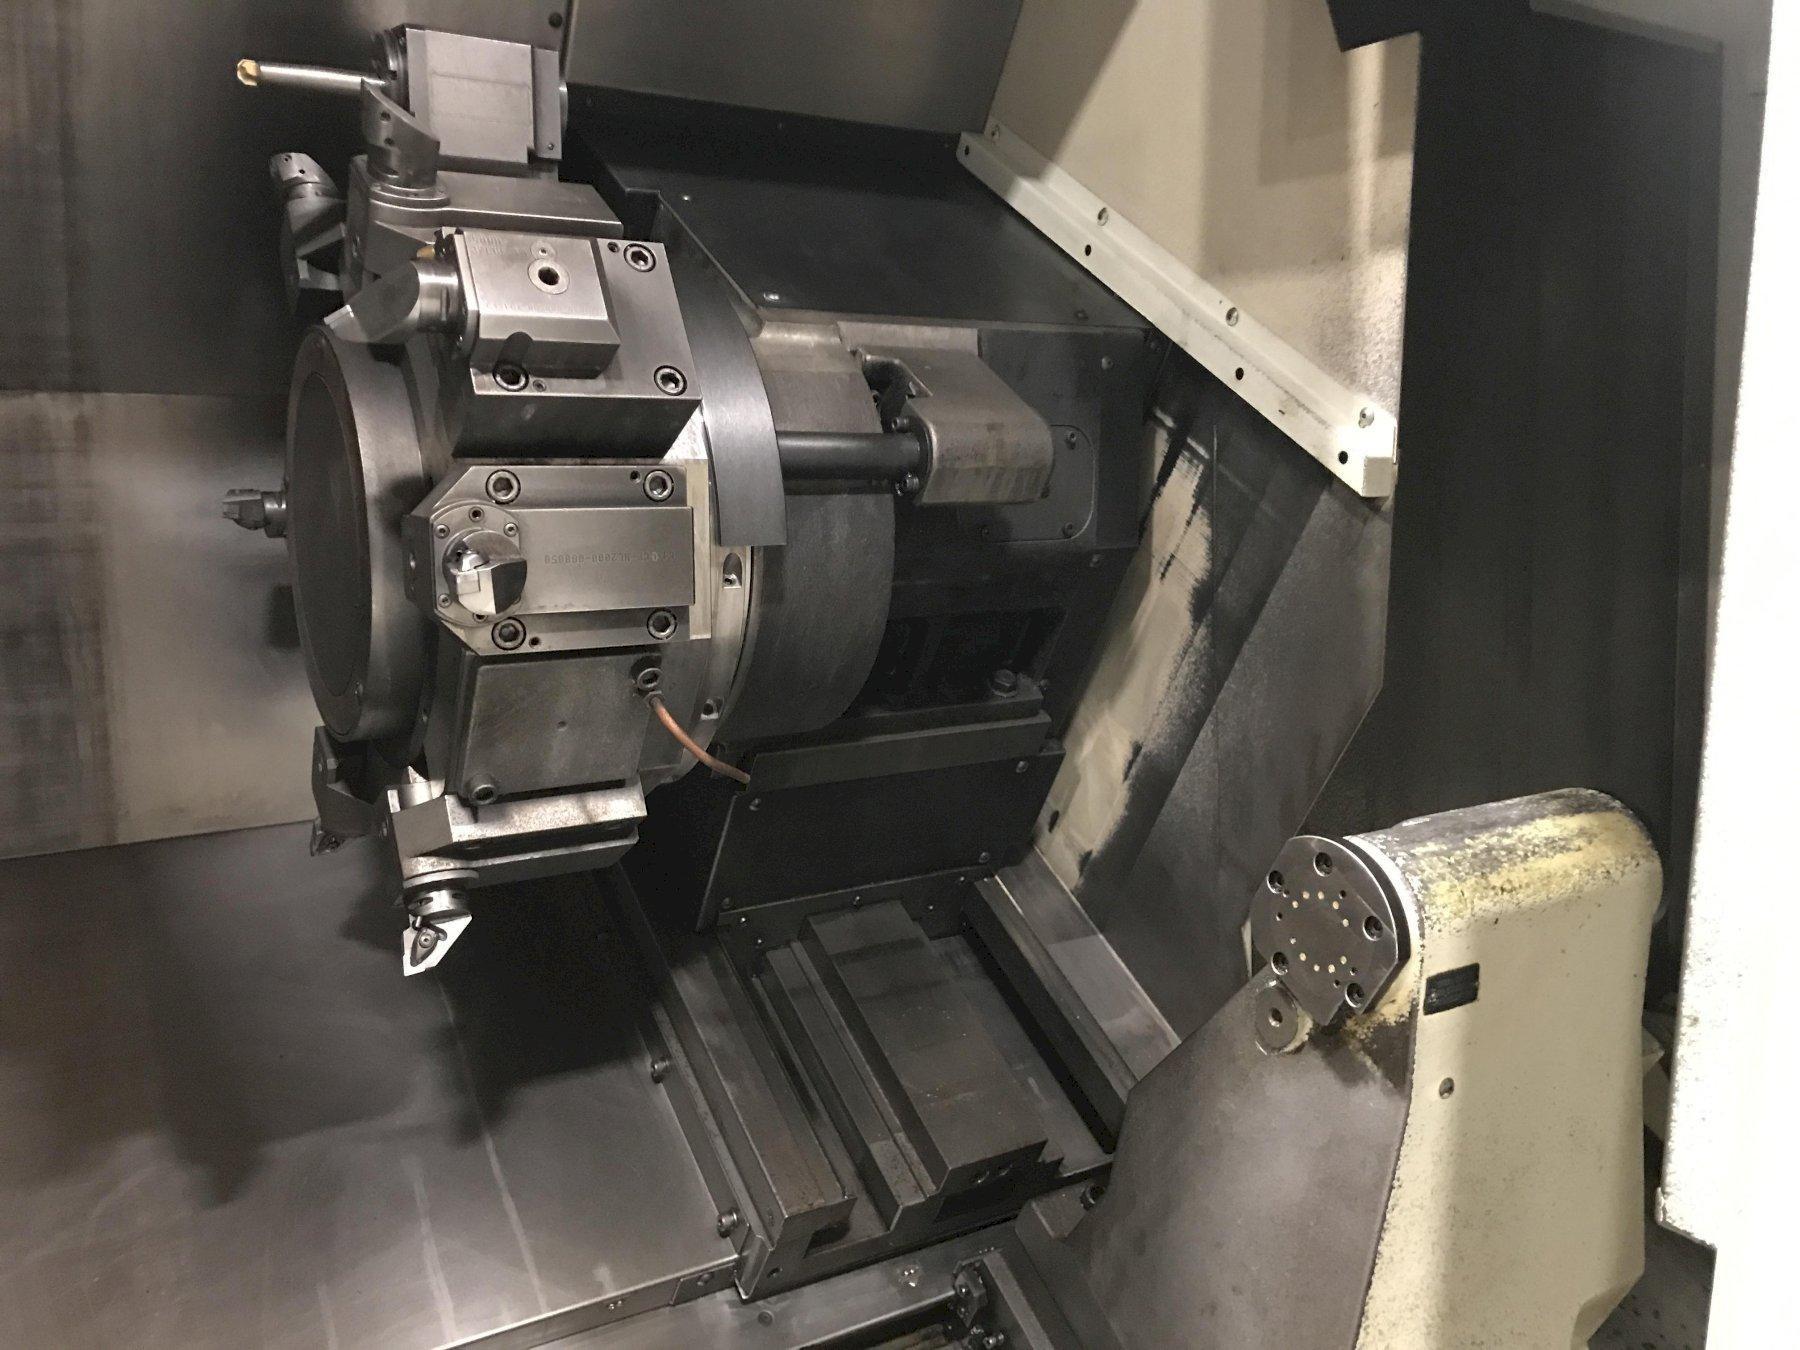 Mori Seiki NL2500MC/700 - CNC Horizontal Lathe